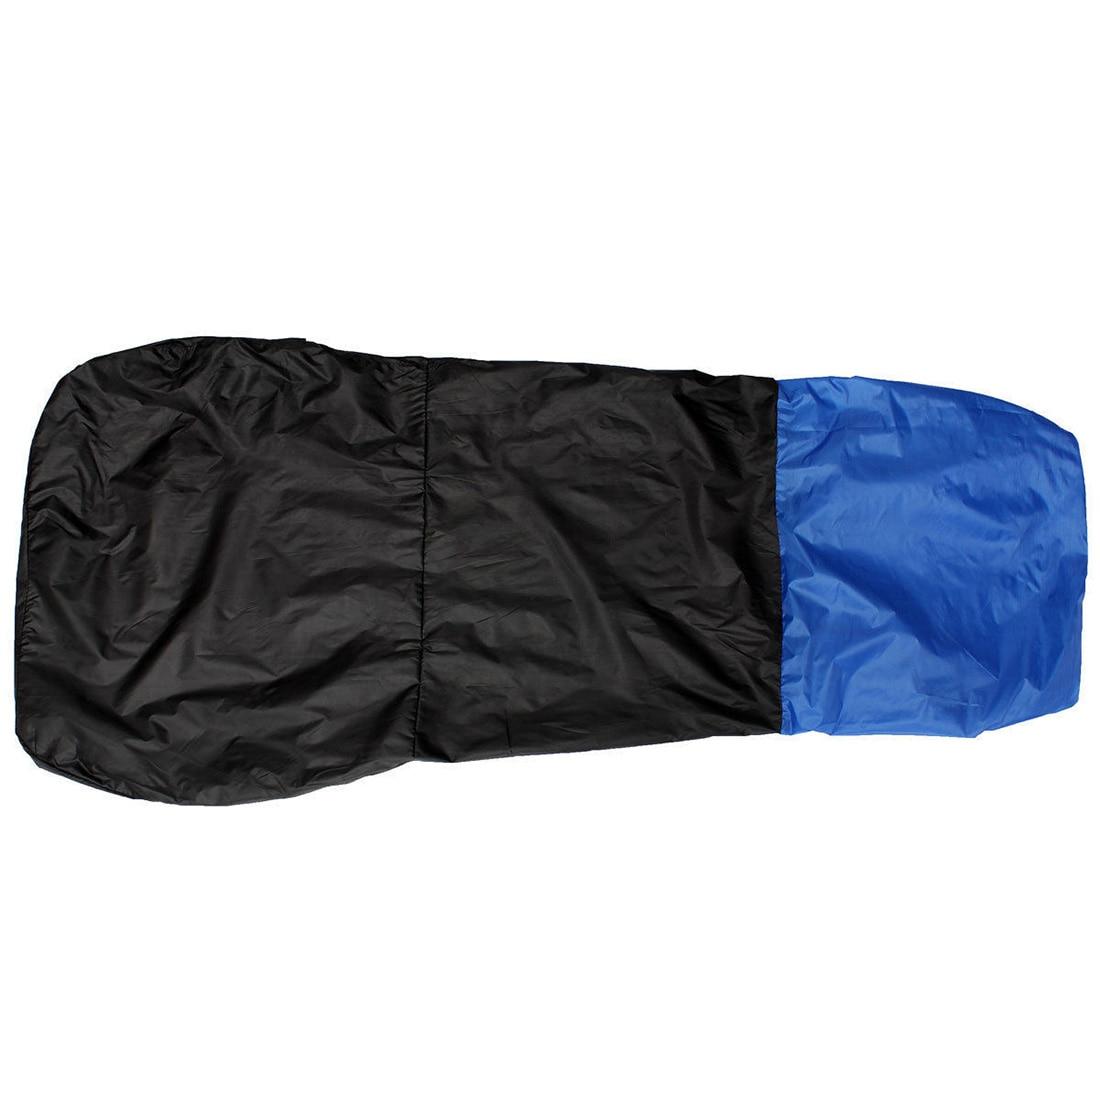 Promotion! 2 Universal CAR/VAN WATERPROOF Nylon BLUE / BLACK FRONT SEAT COVERS / PROTECTORS